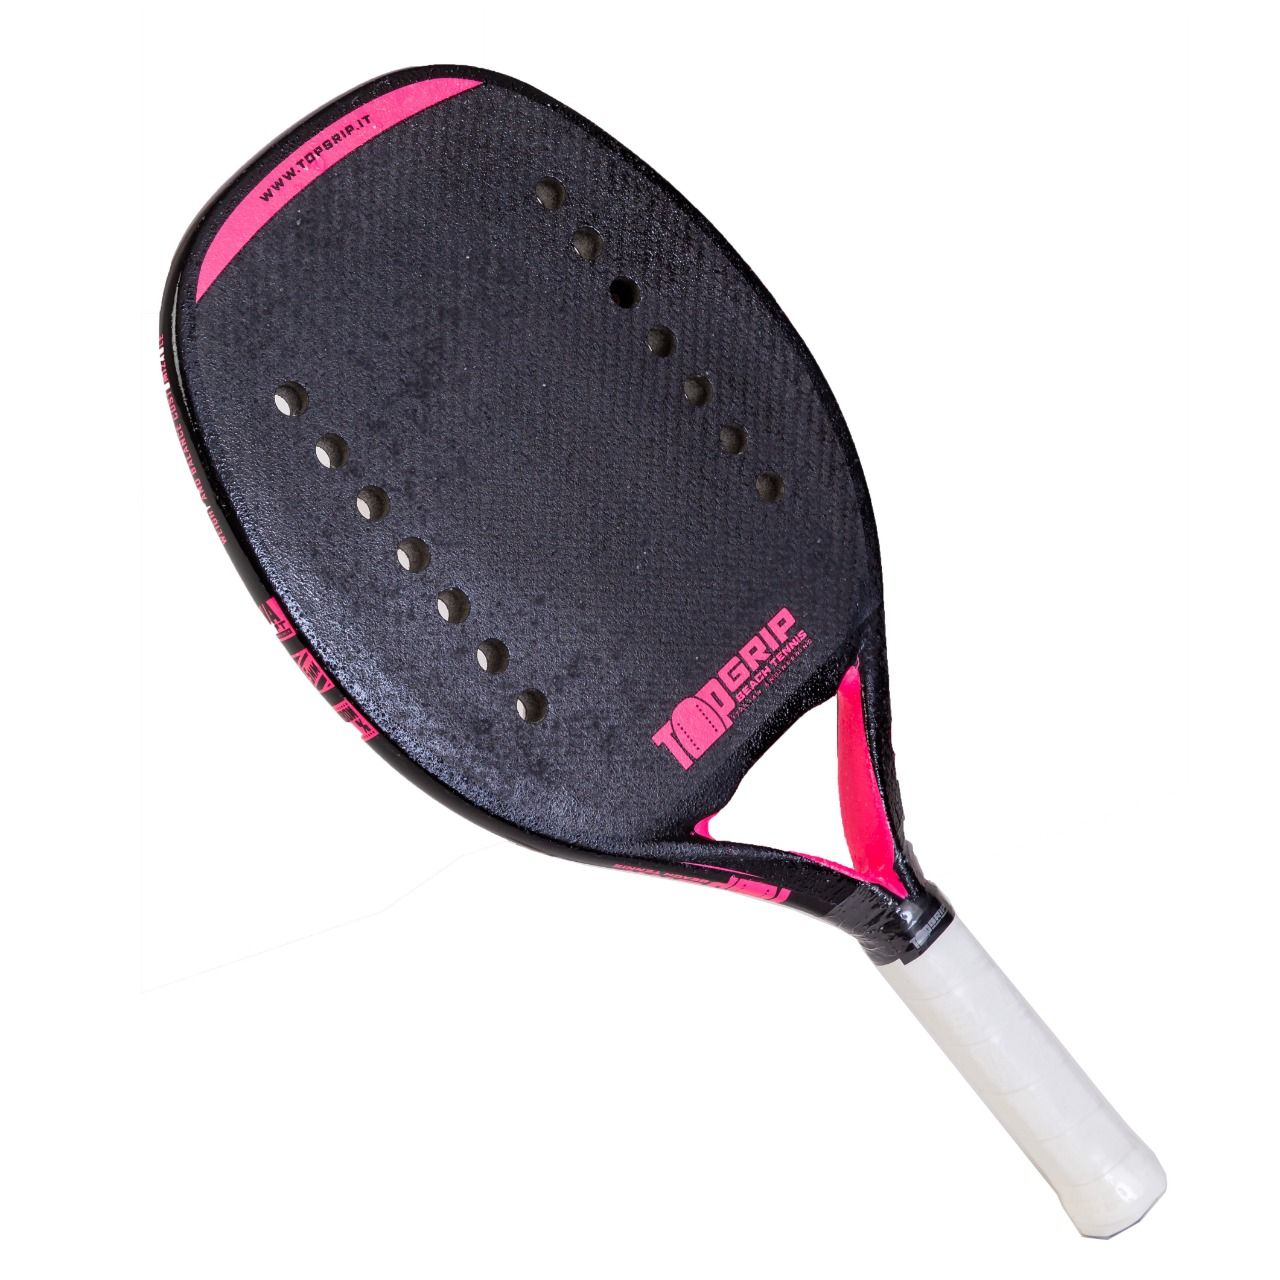 Raquete de Beach Tennis Top Grip Pink